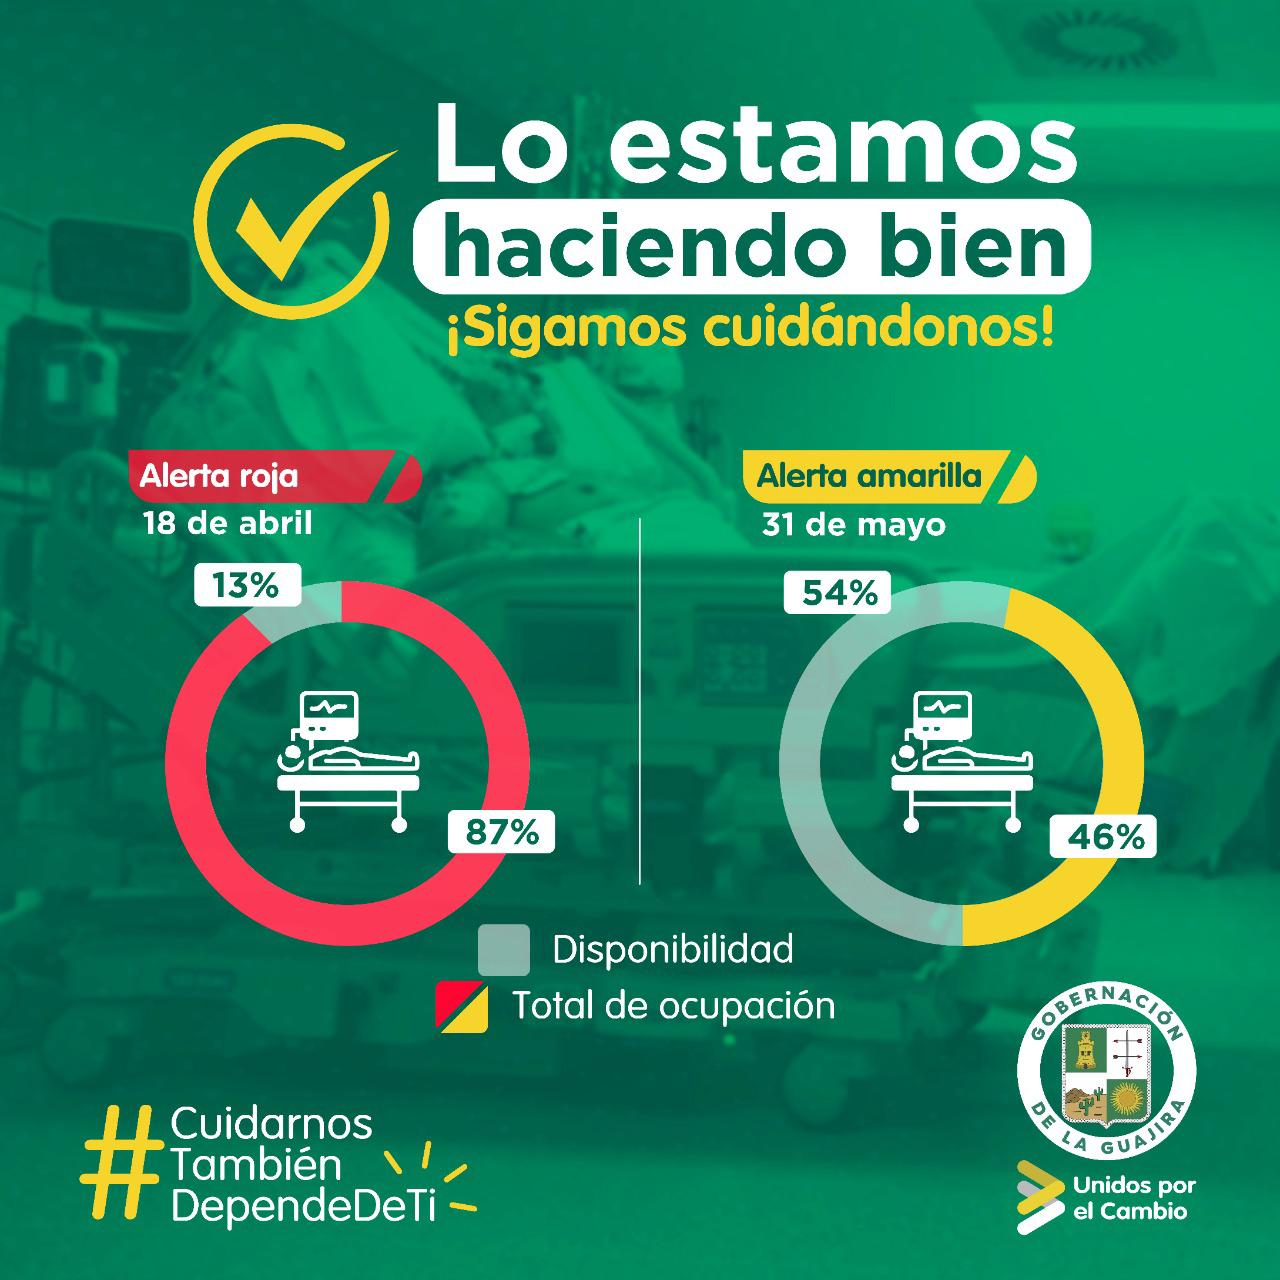 https://www.notasrosas.com/ En La Guajira declaran Alerta Amarilla Hospitalaria